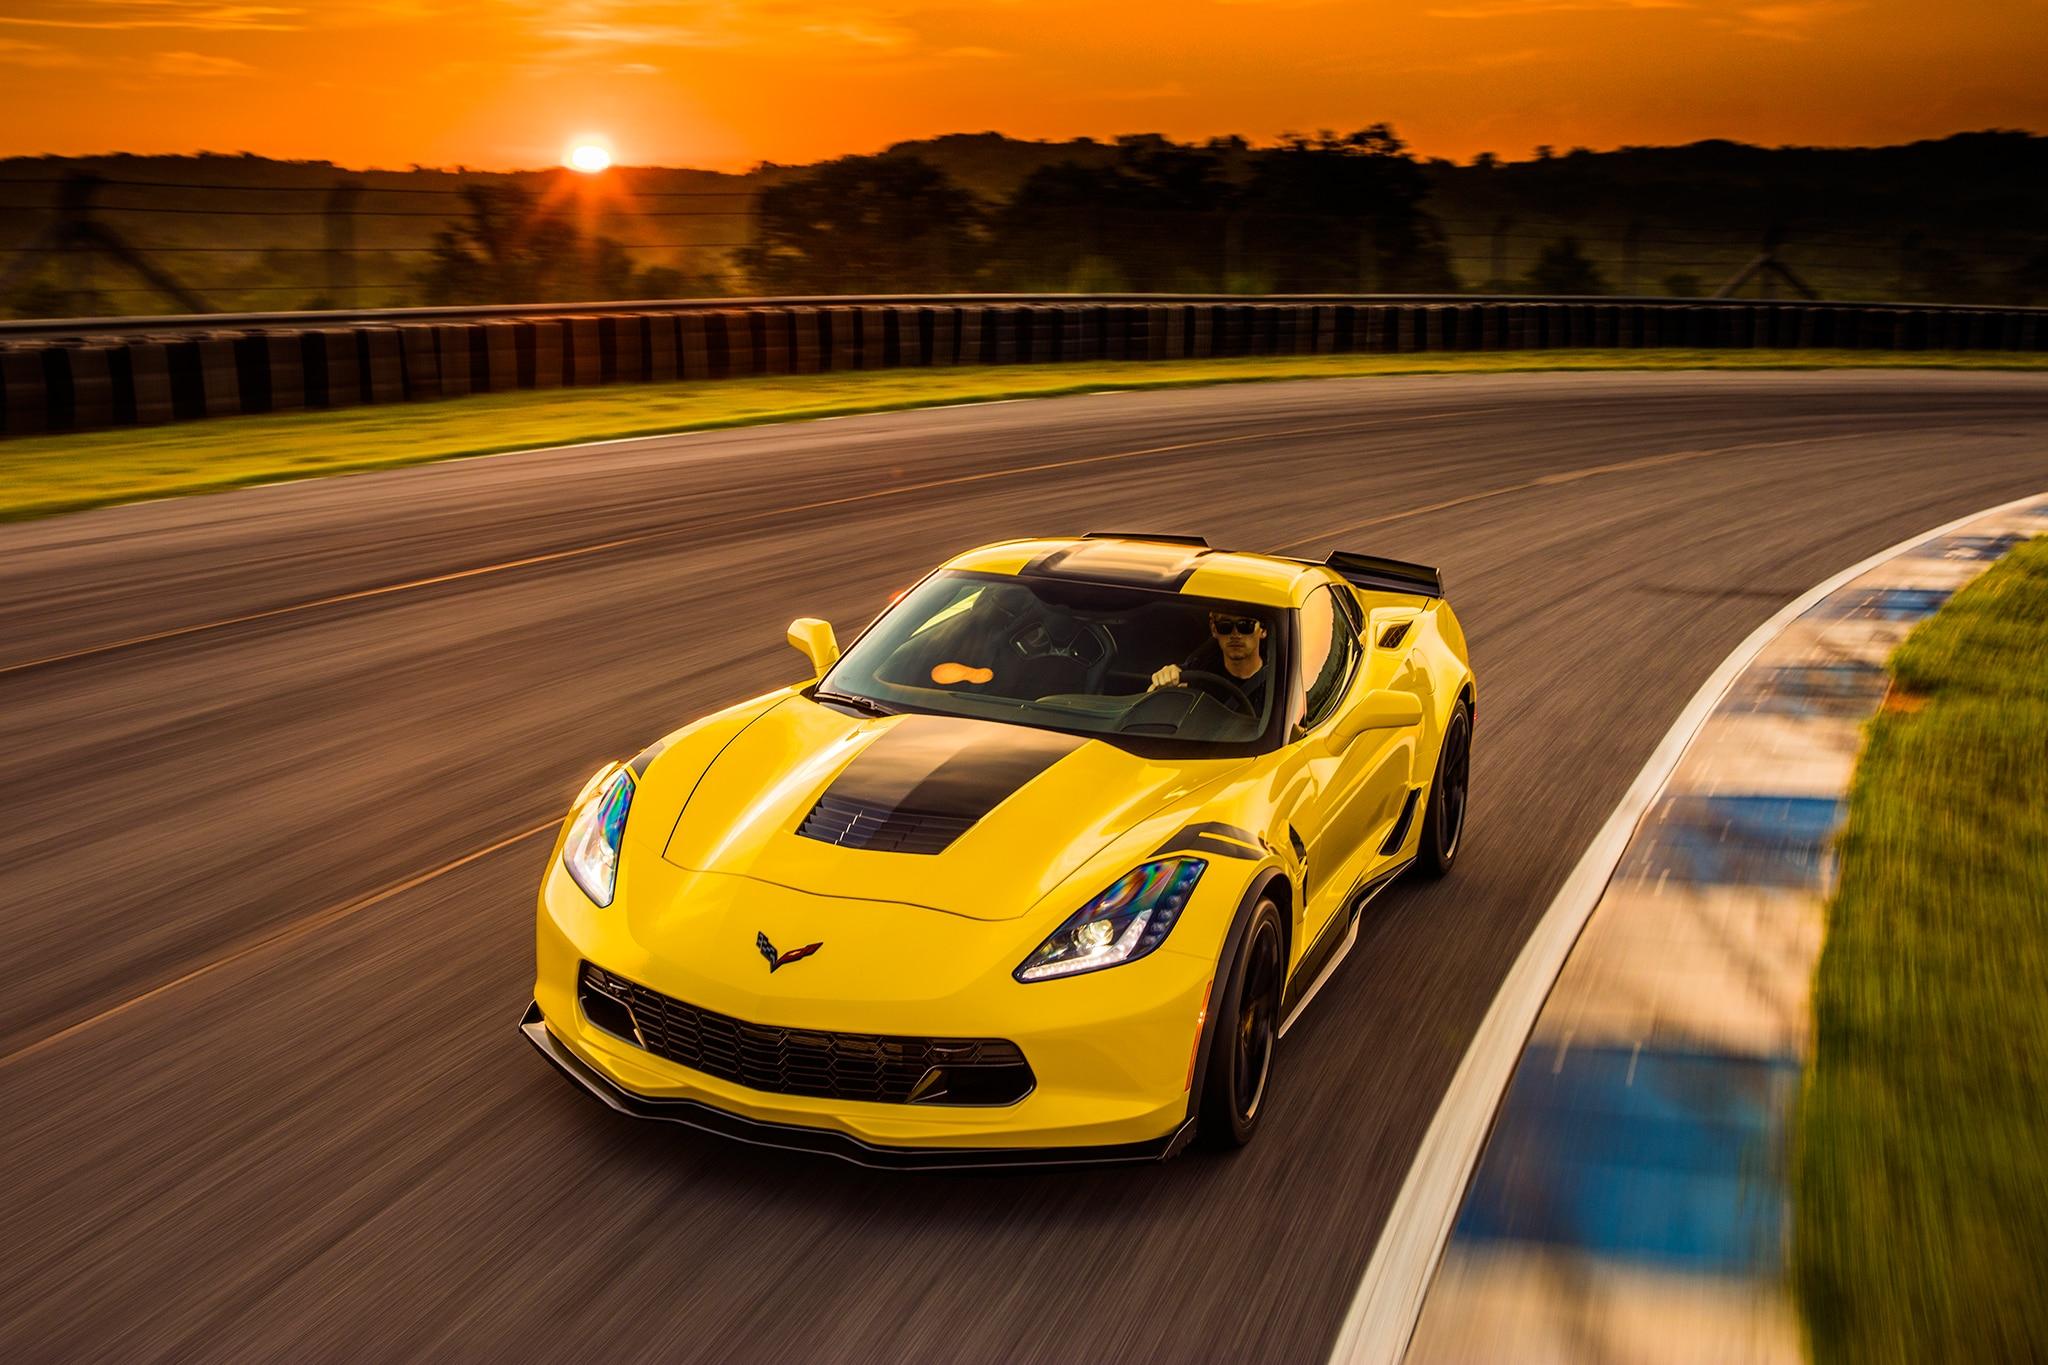 2017 Chevrolet Corvette Grand Sport Automatic First Drive